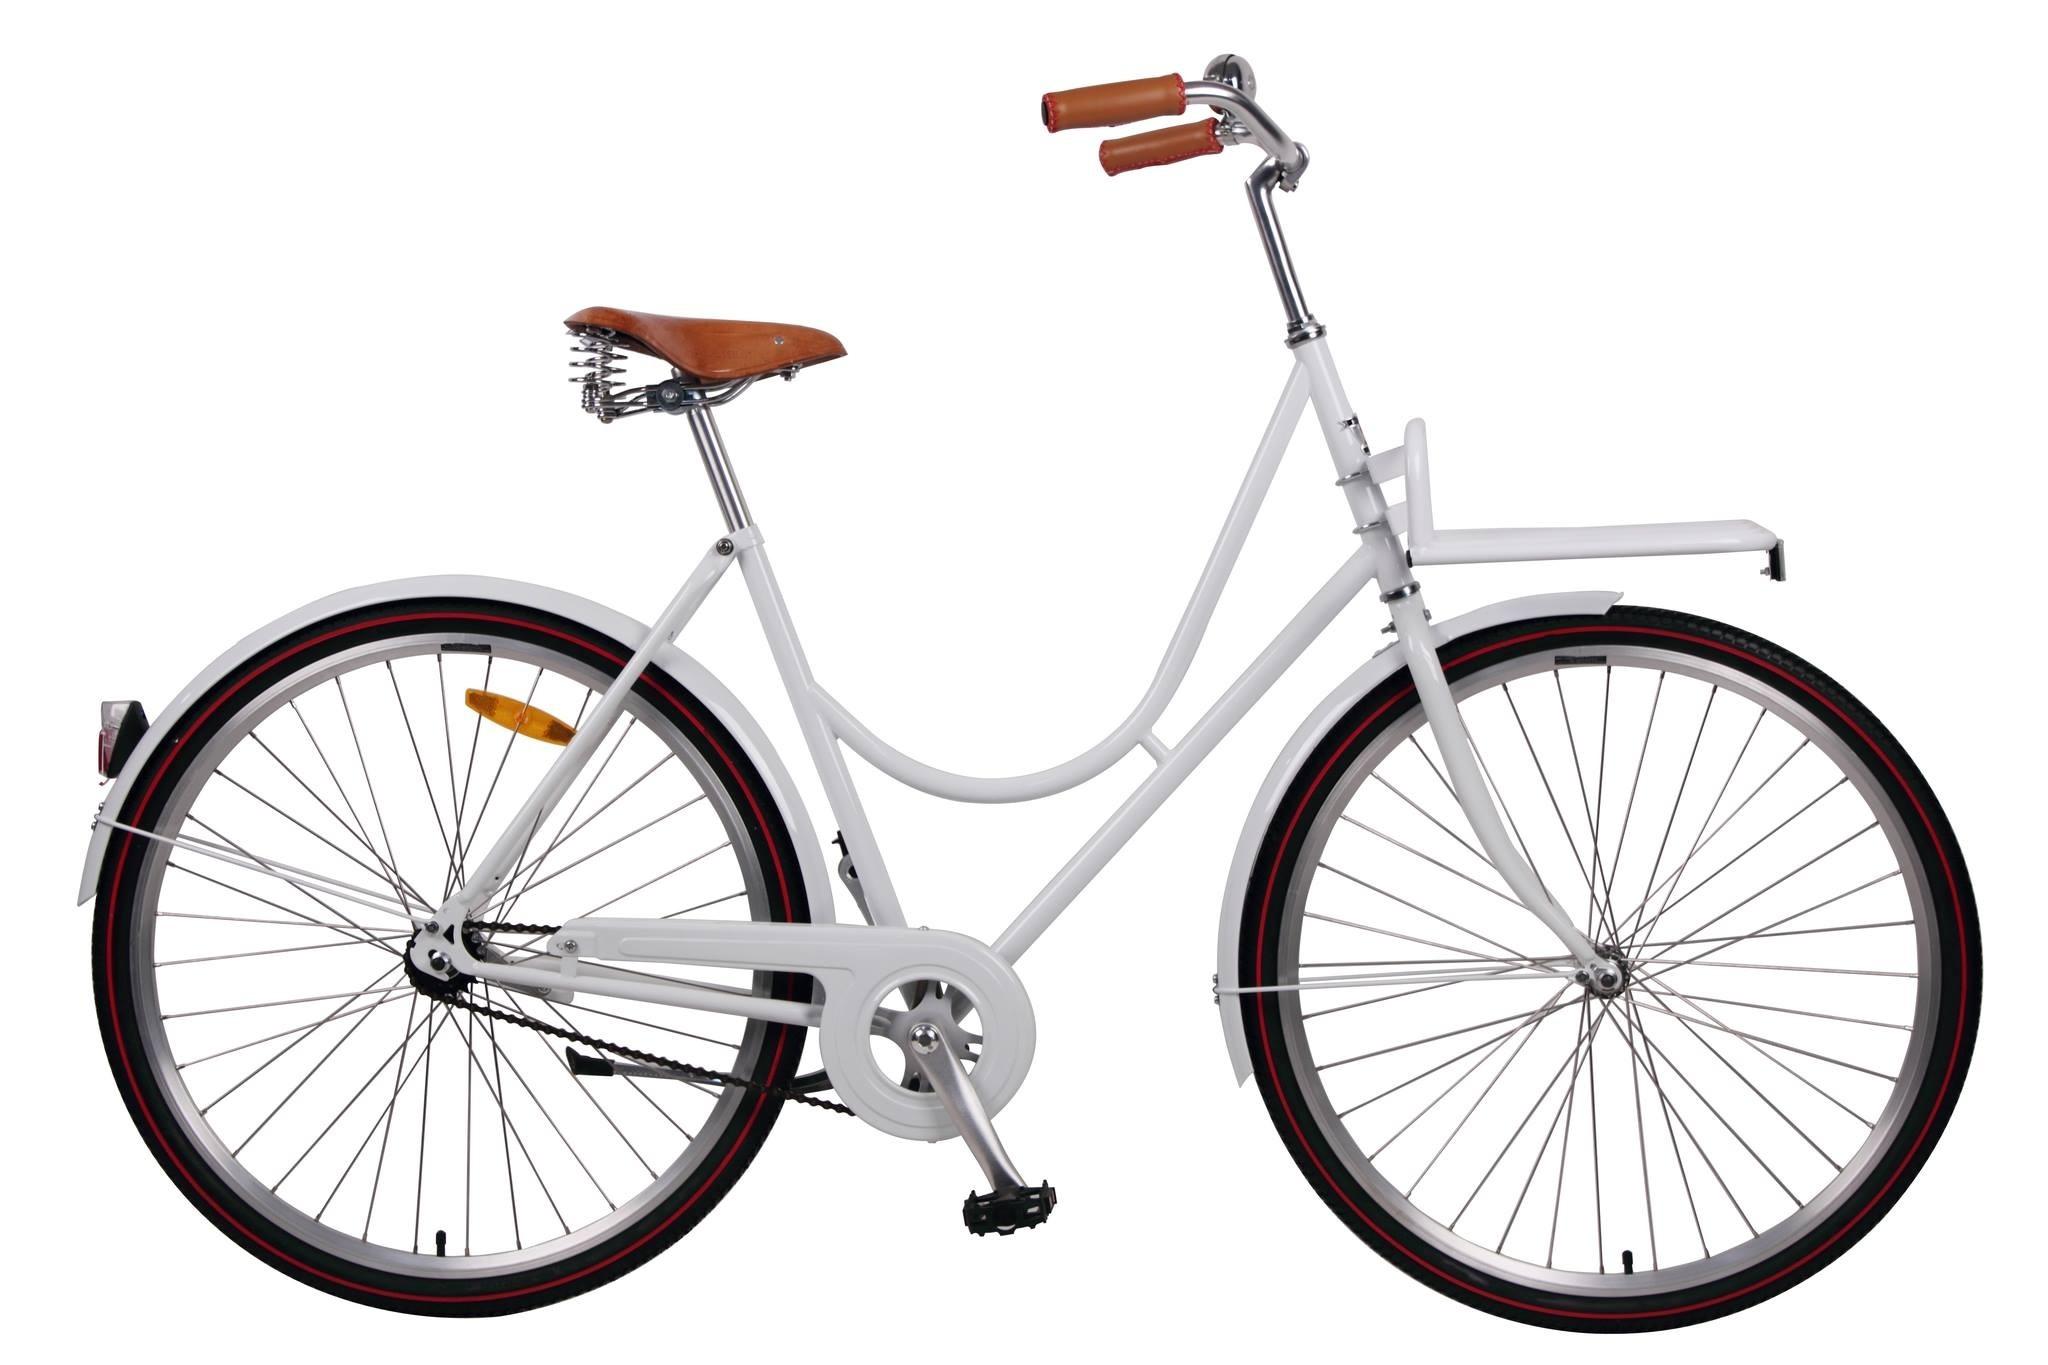 Stålhästen – a trendy bike